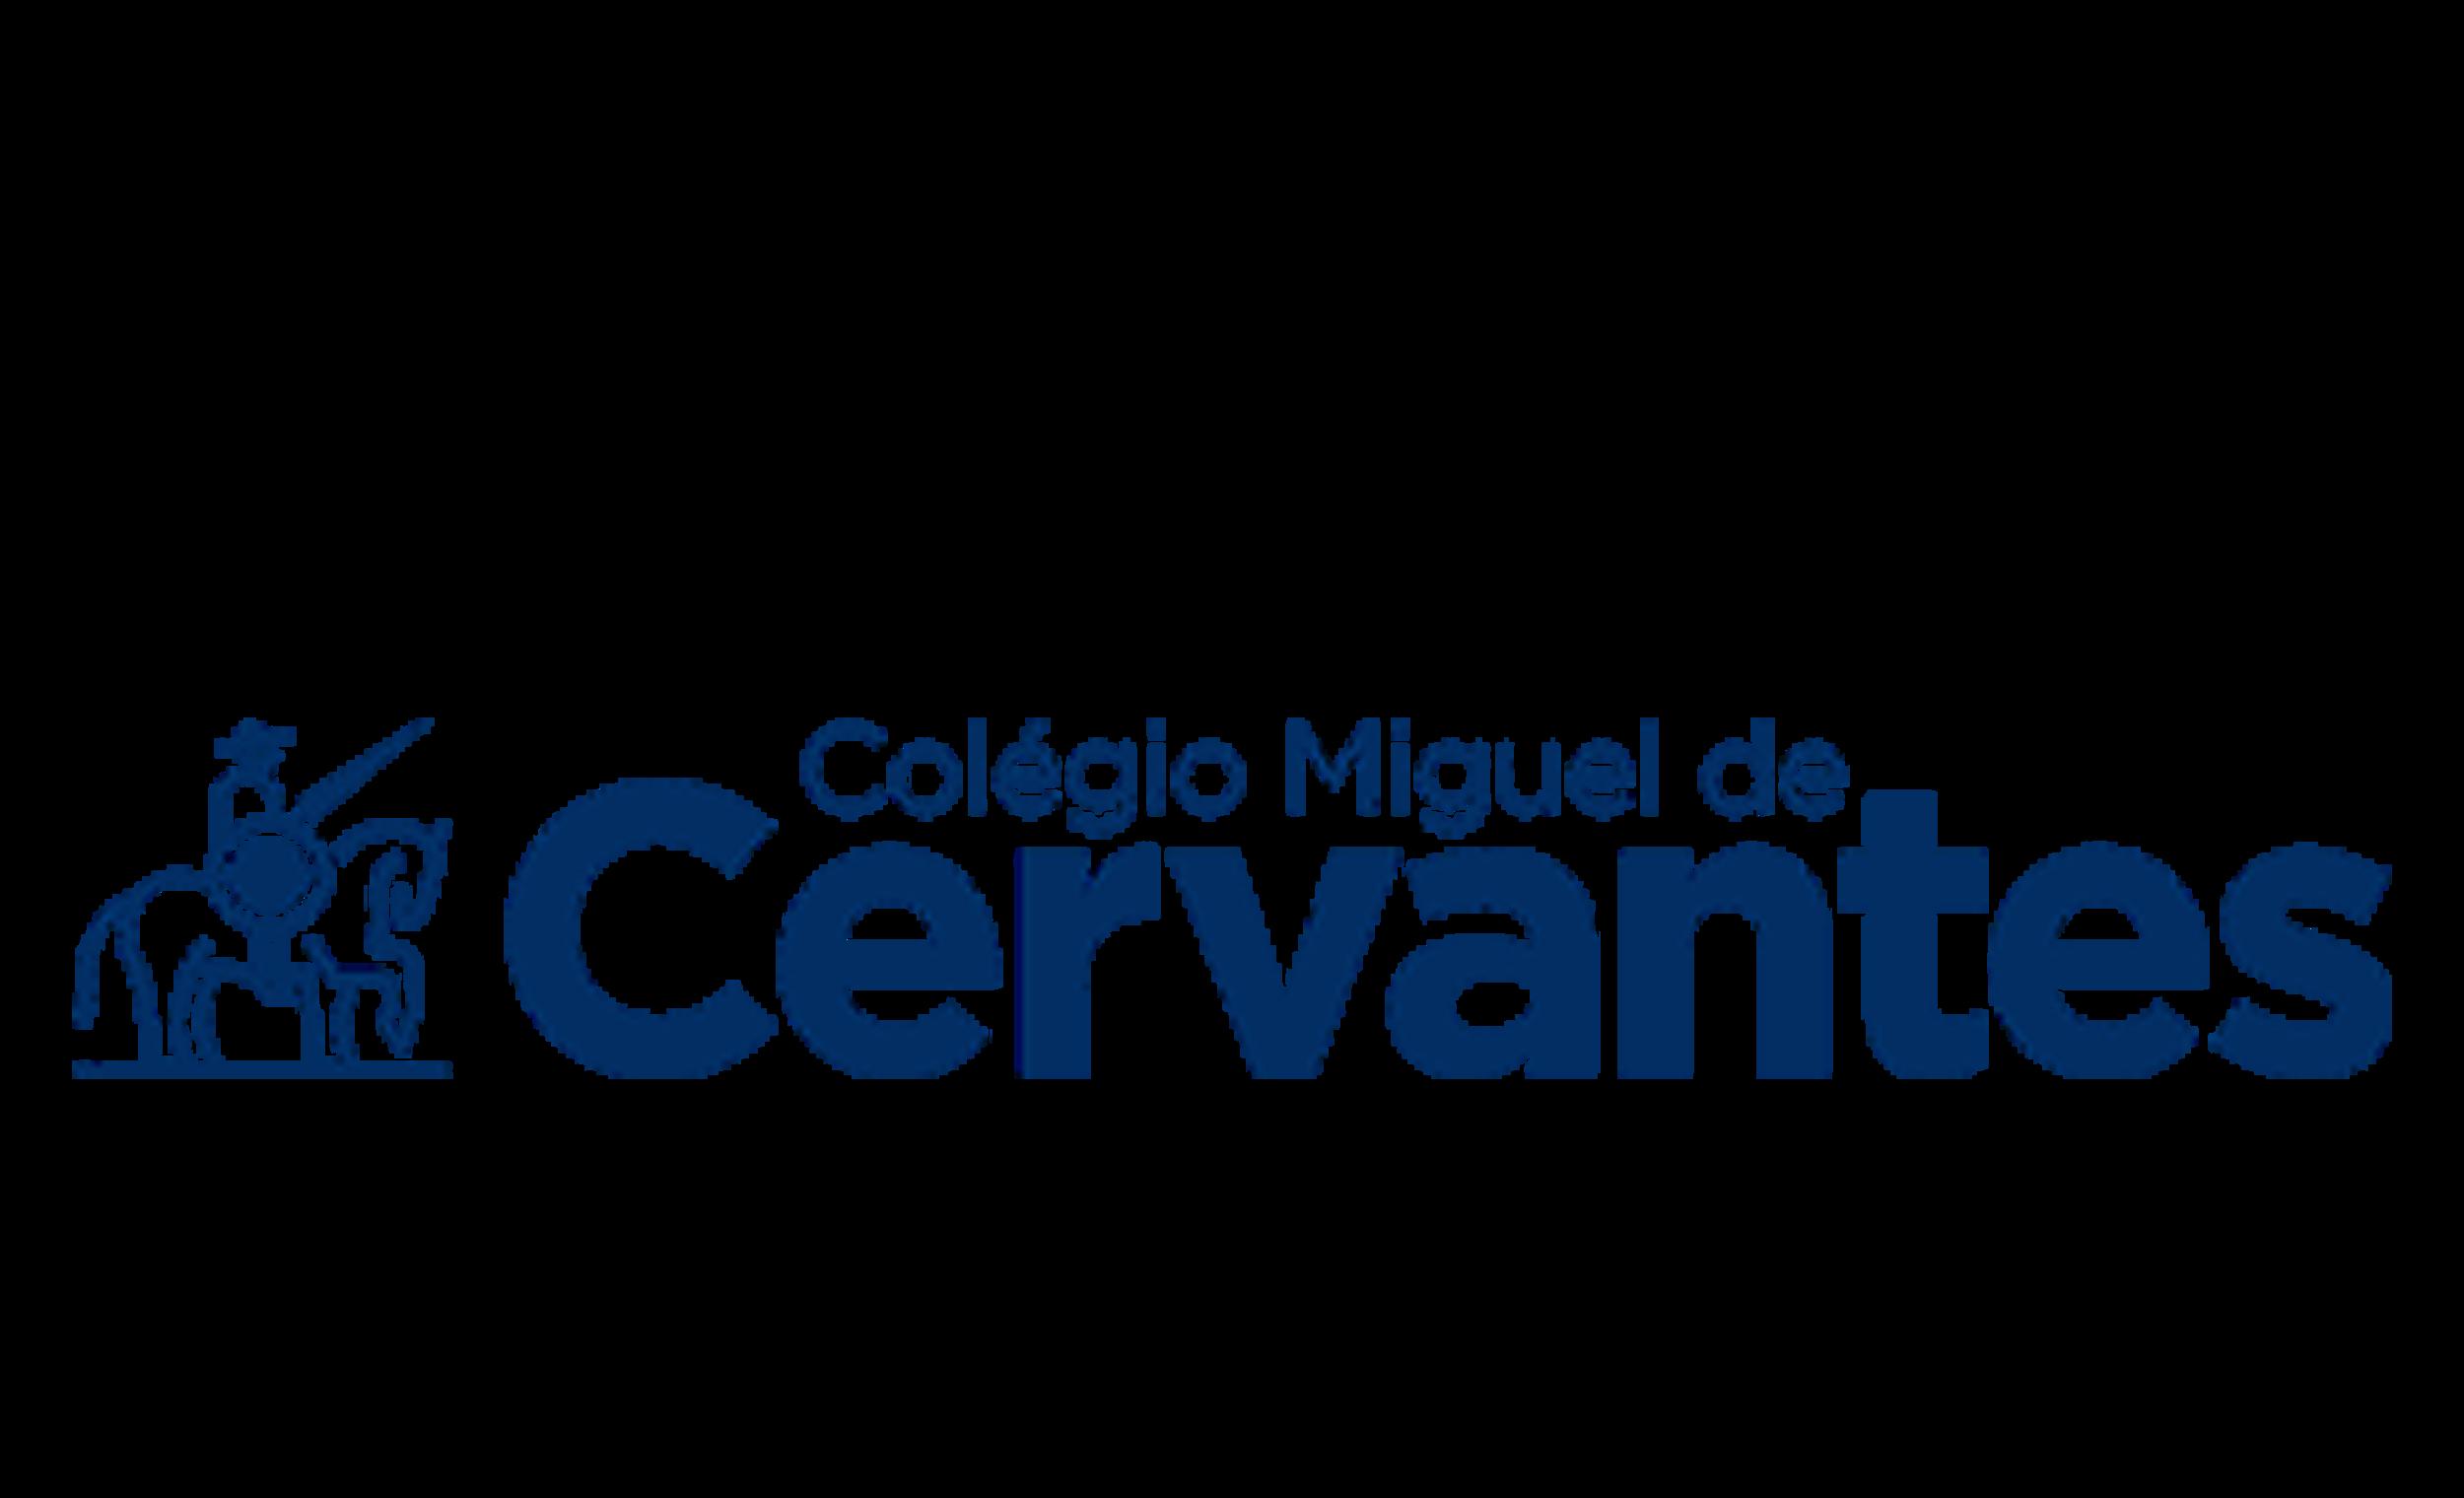 _0022_Miguel-de-Cervantes.png.png./